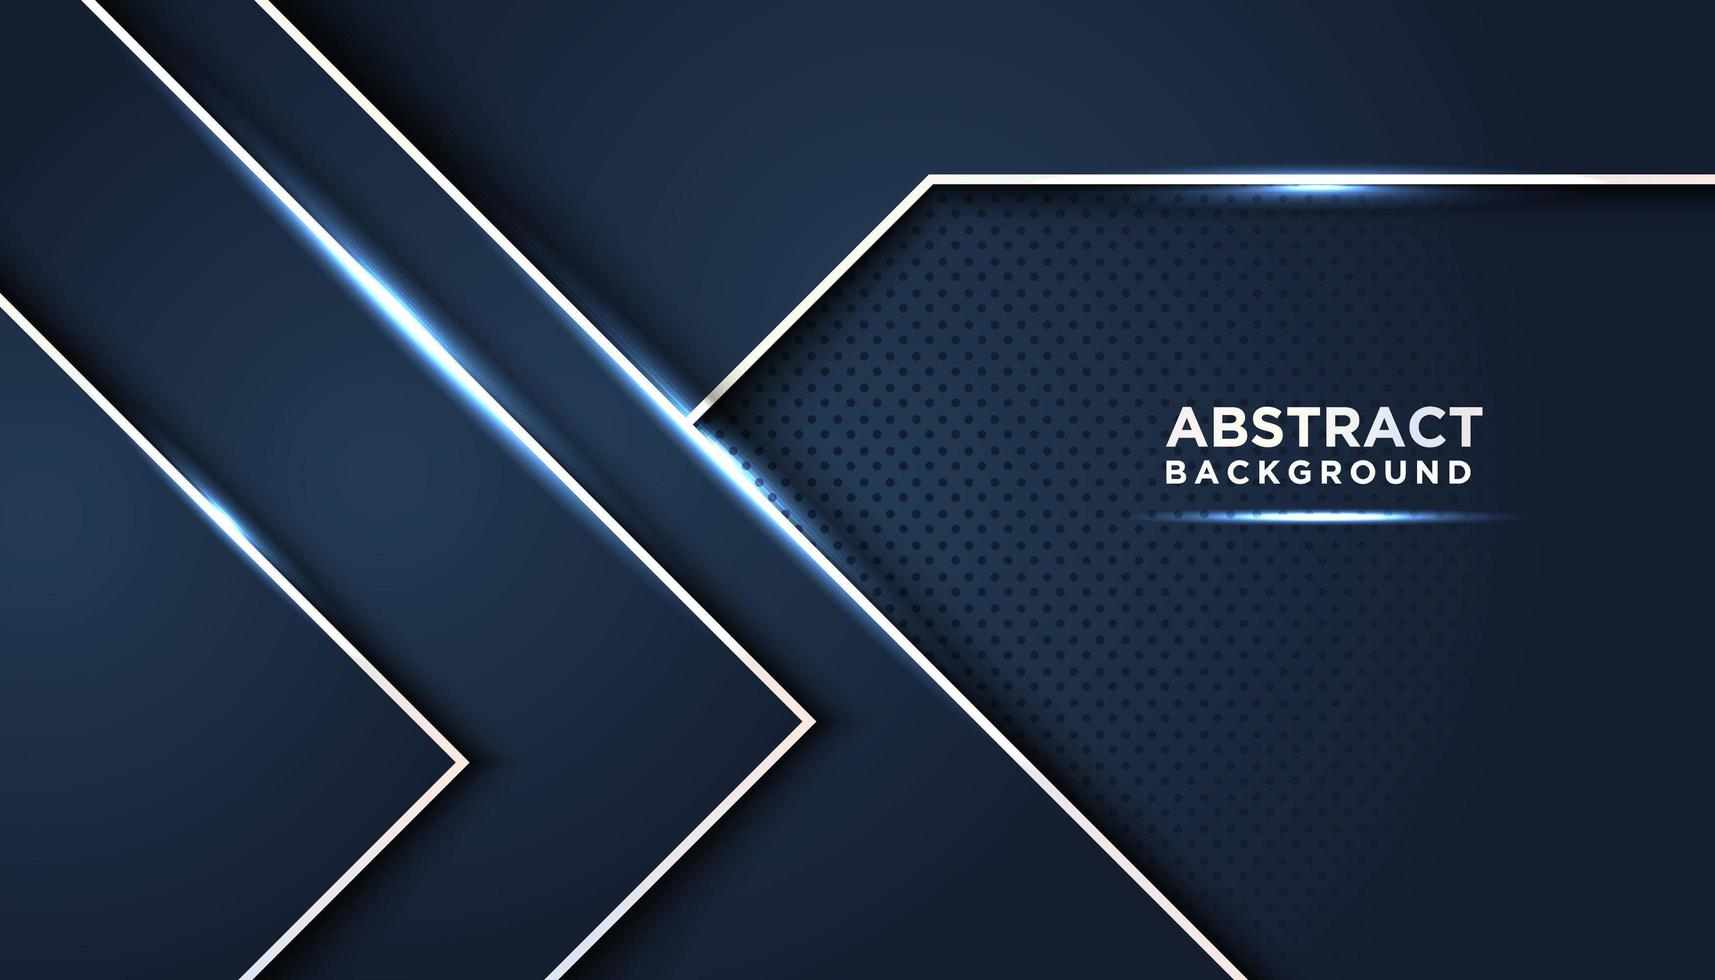 Fondo abstracto azul oscuro con capas geométricas brillantes vector